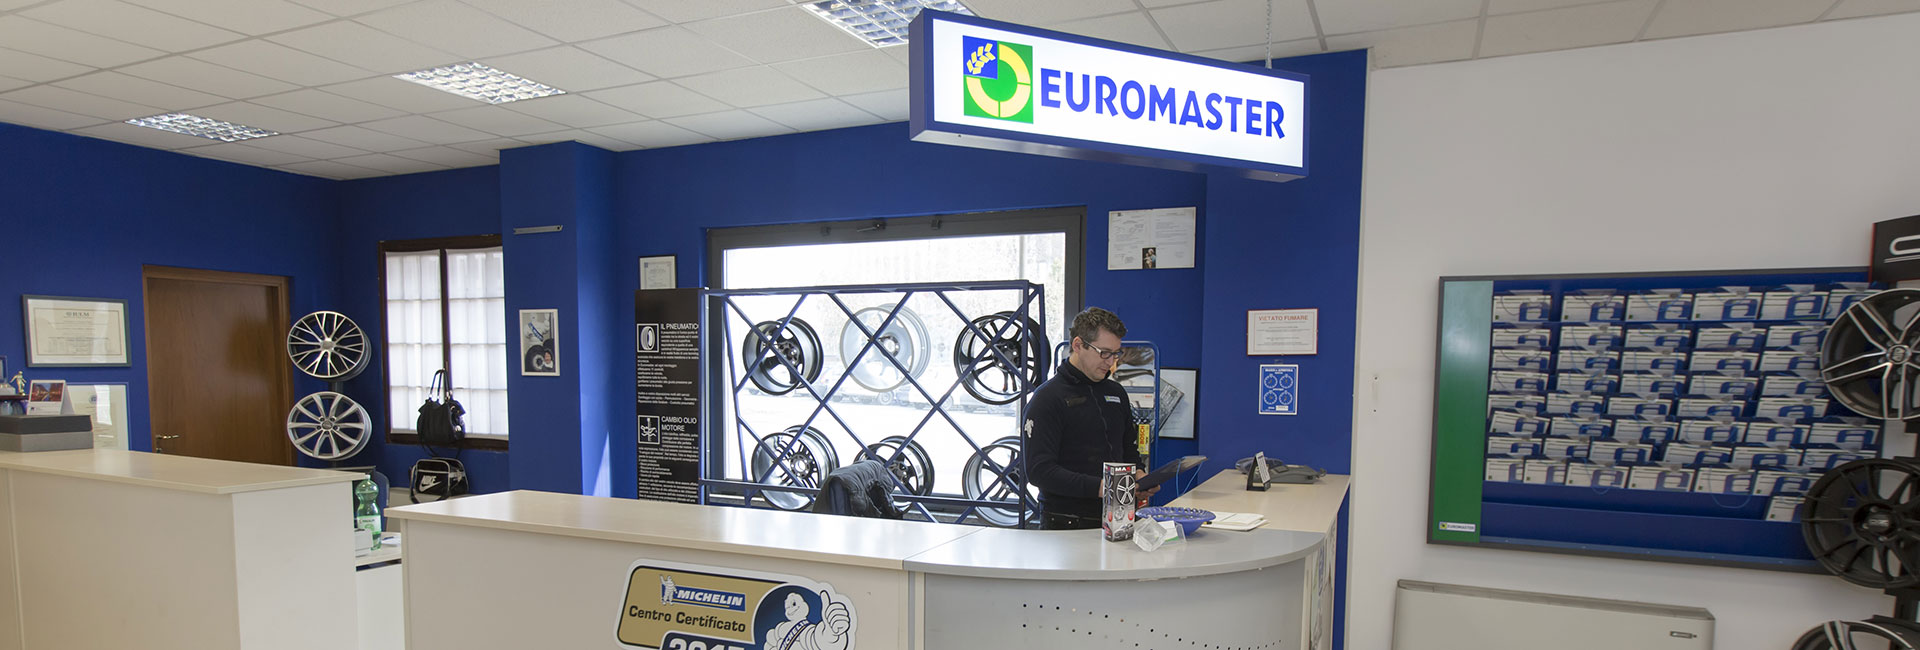 Giommasta Euromaster Caravaggio e Treviglio